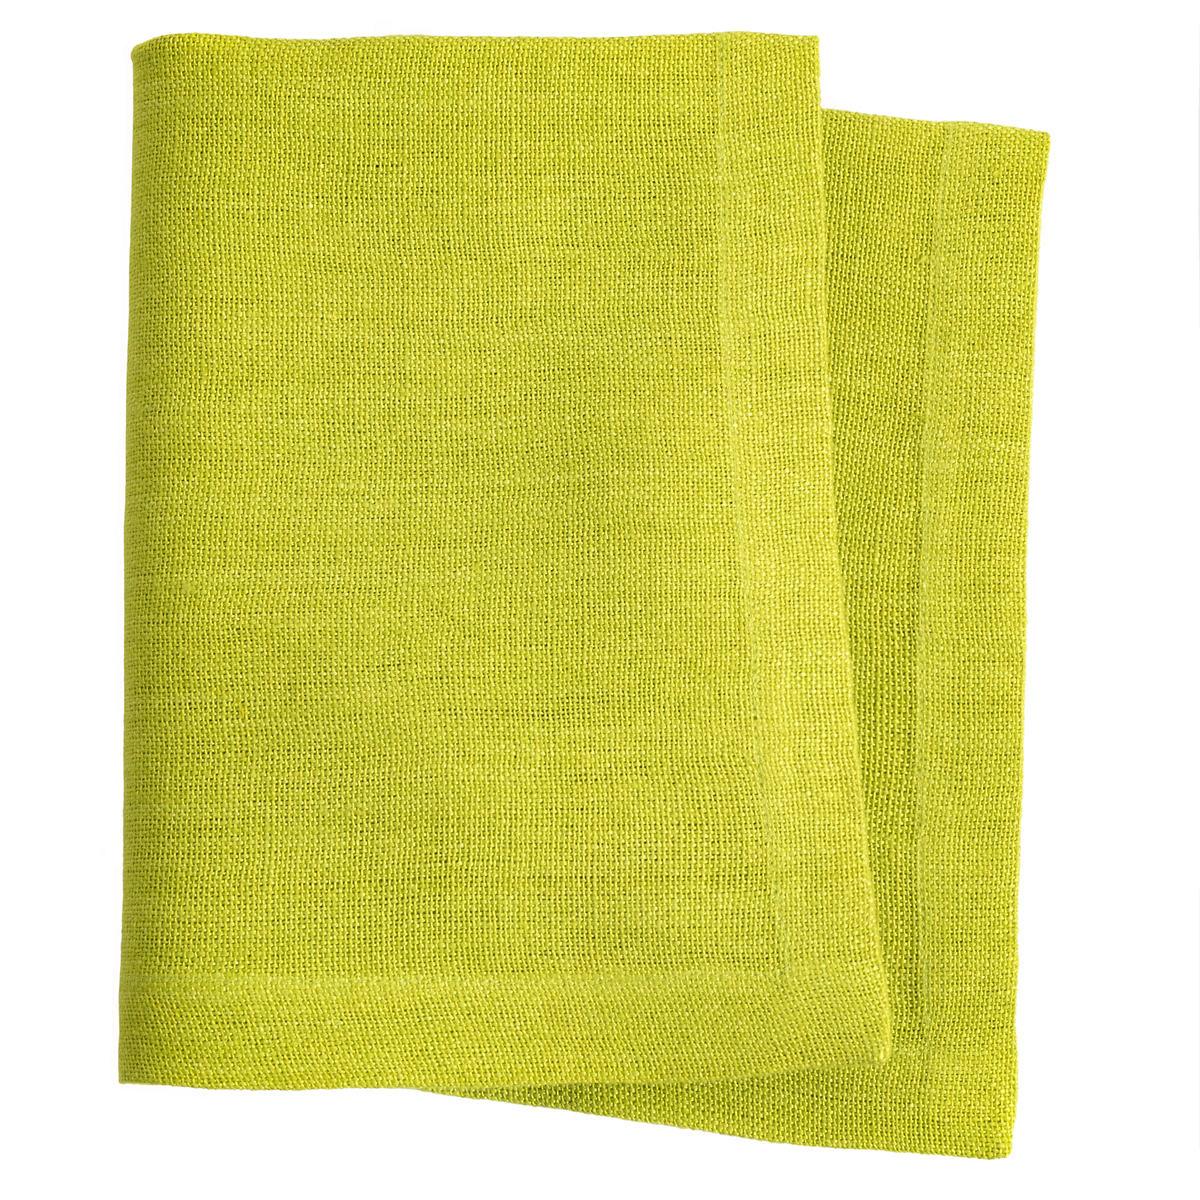 Stone Washed Linen Green Napkin Set